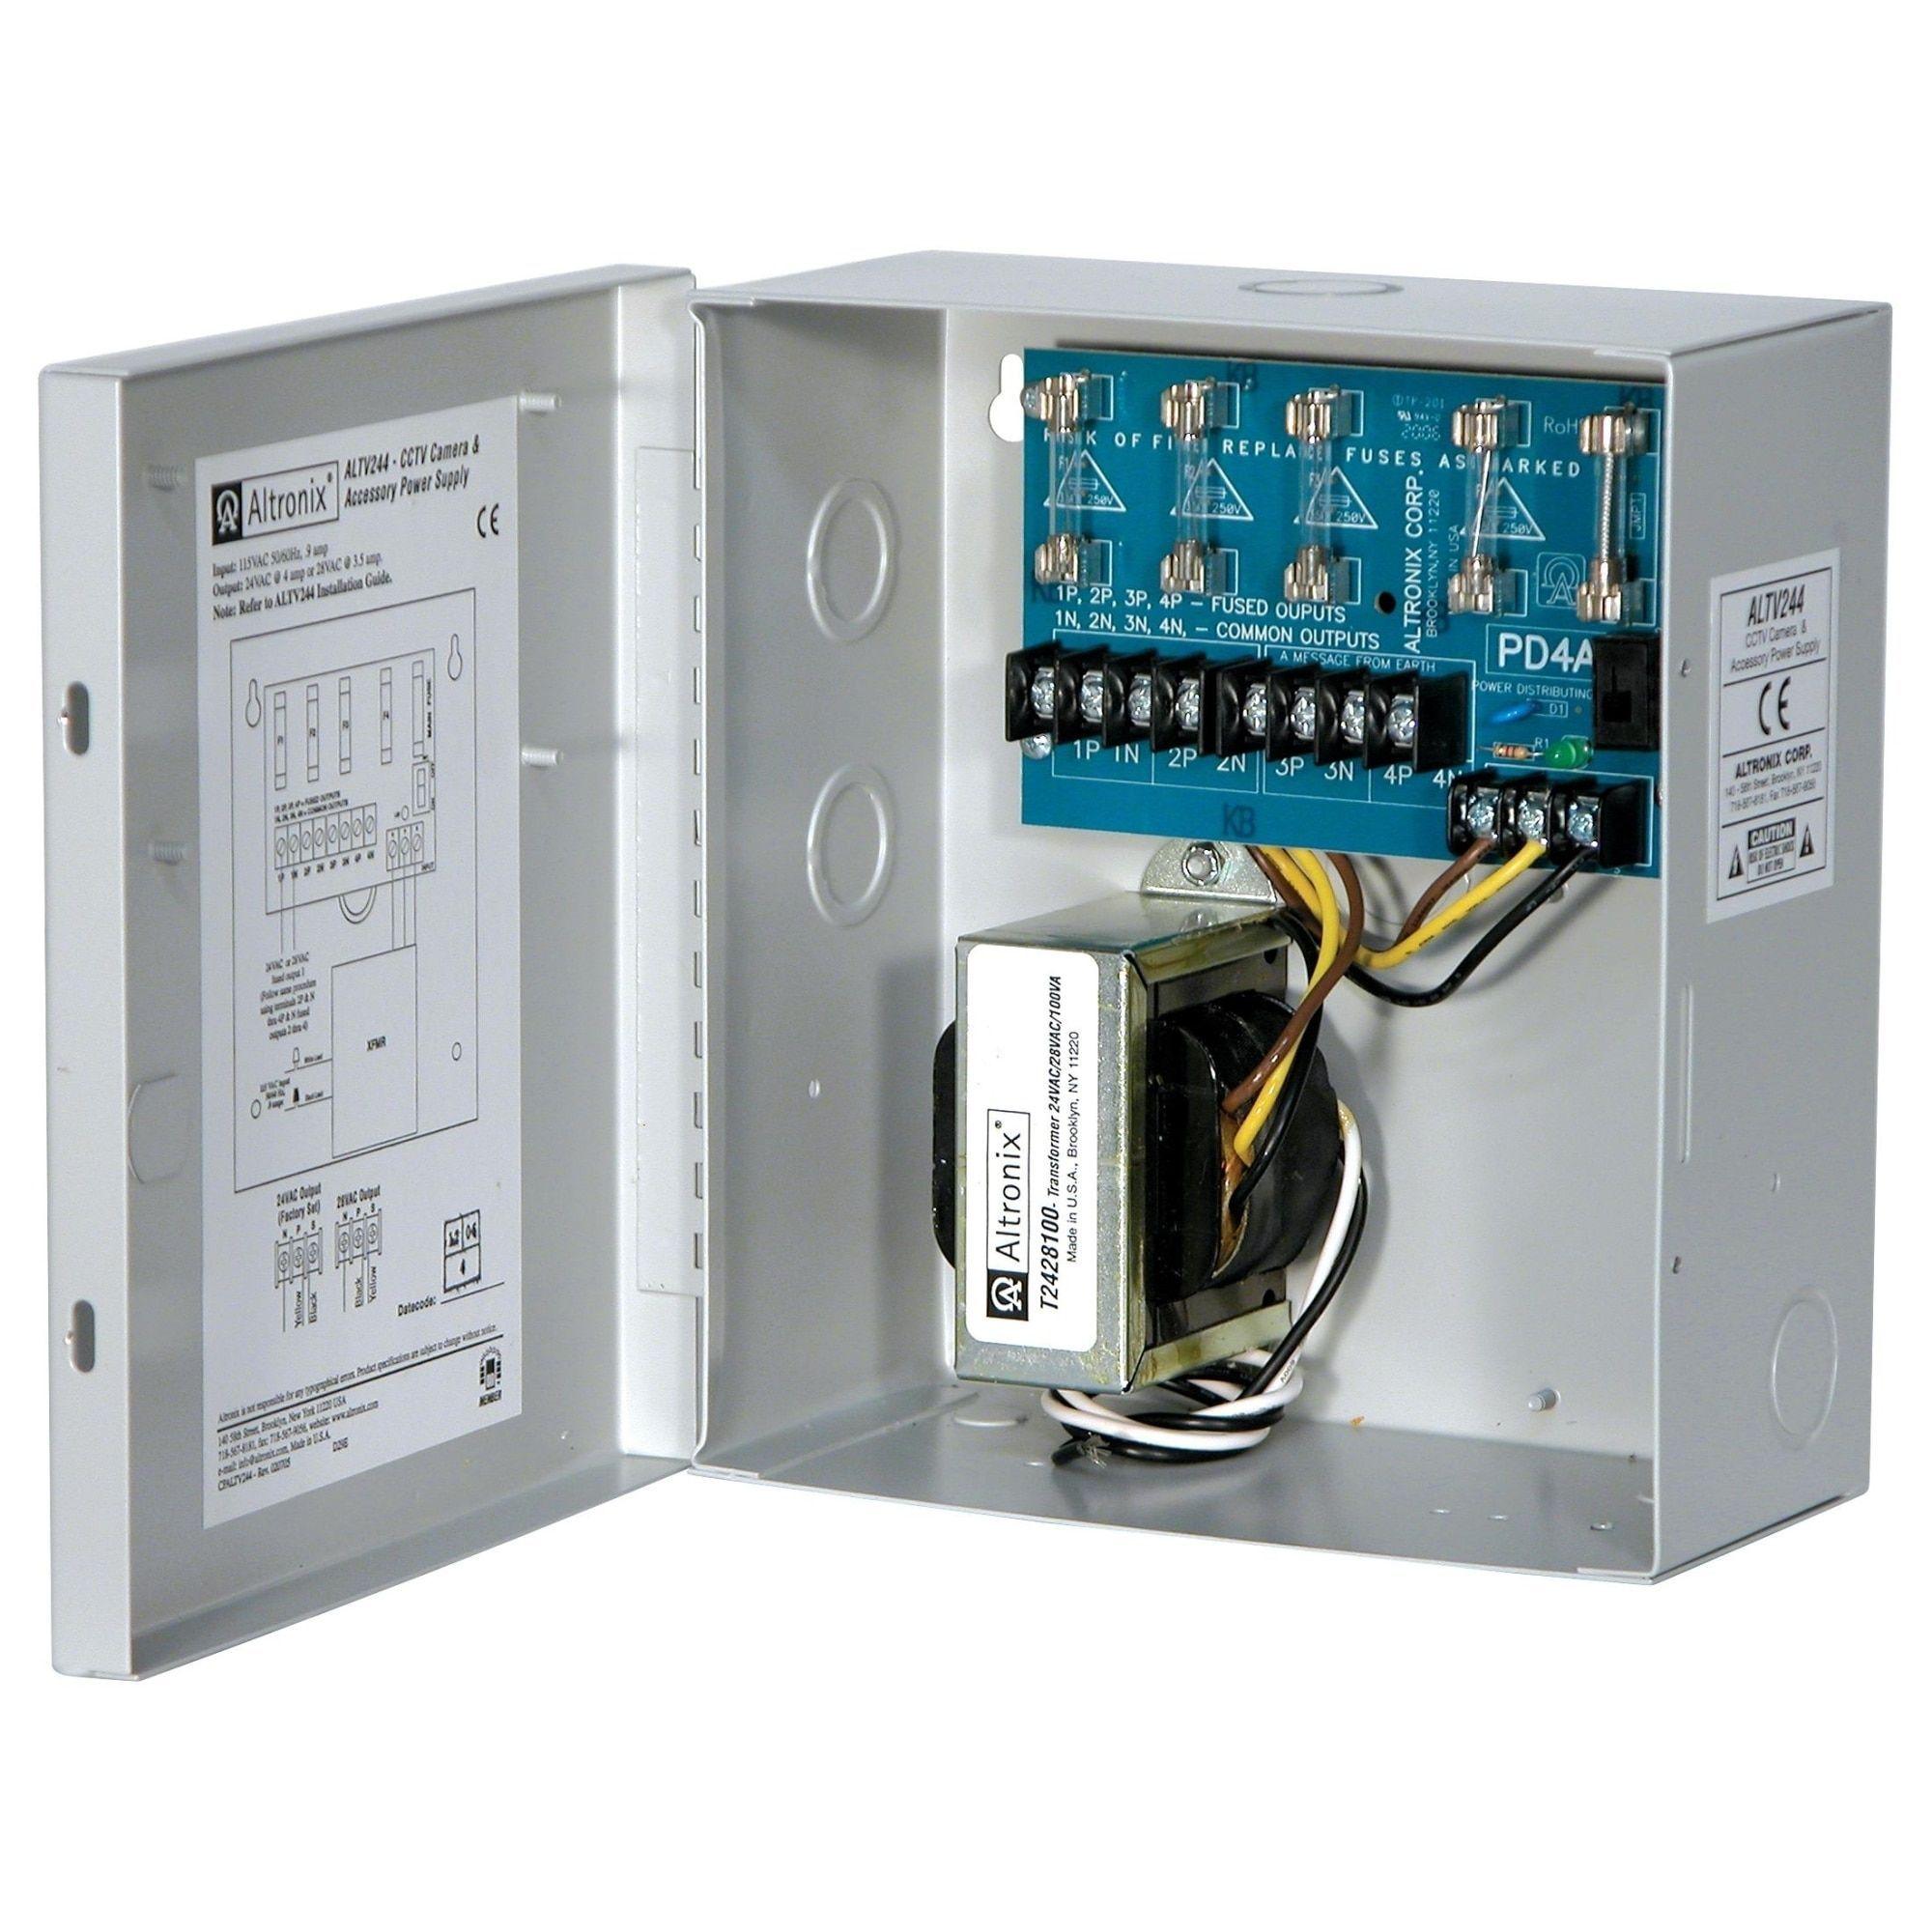 Altronix Proprietary Power Supply AL1012ULXPD16CB